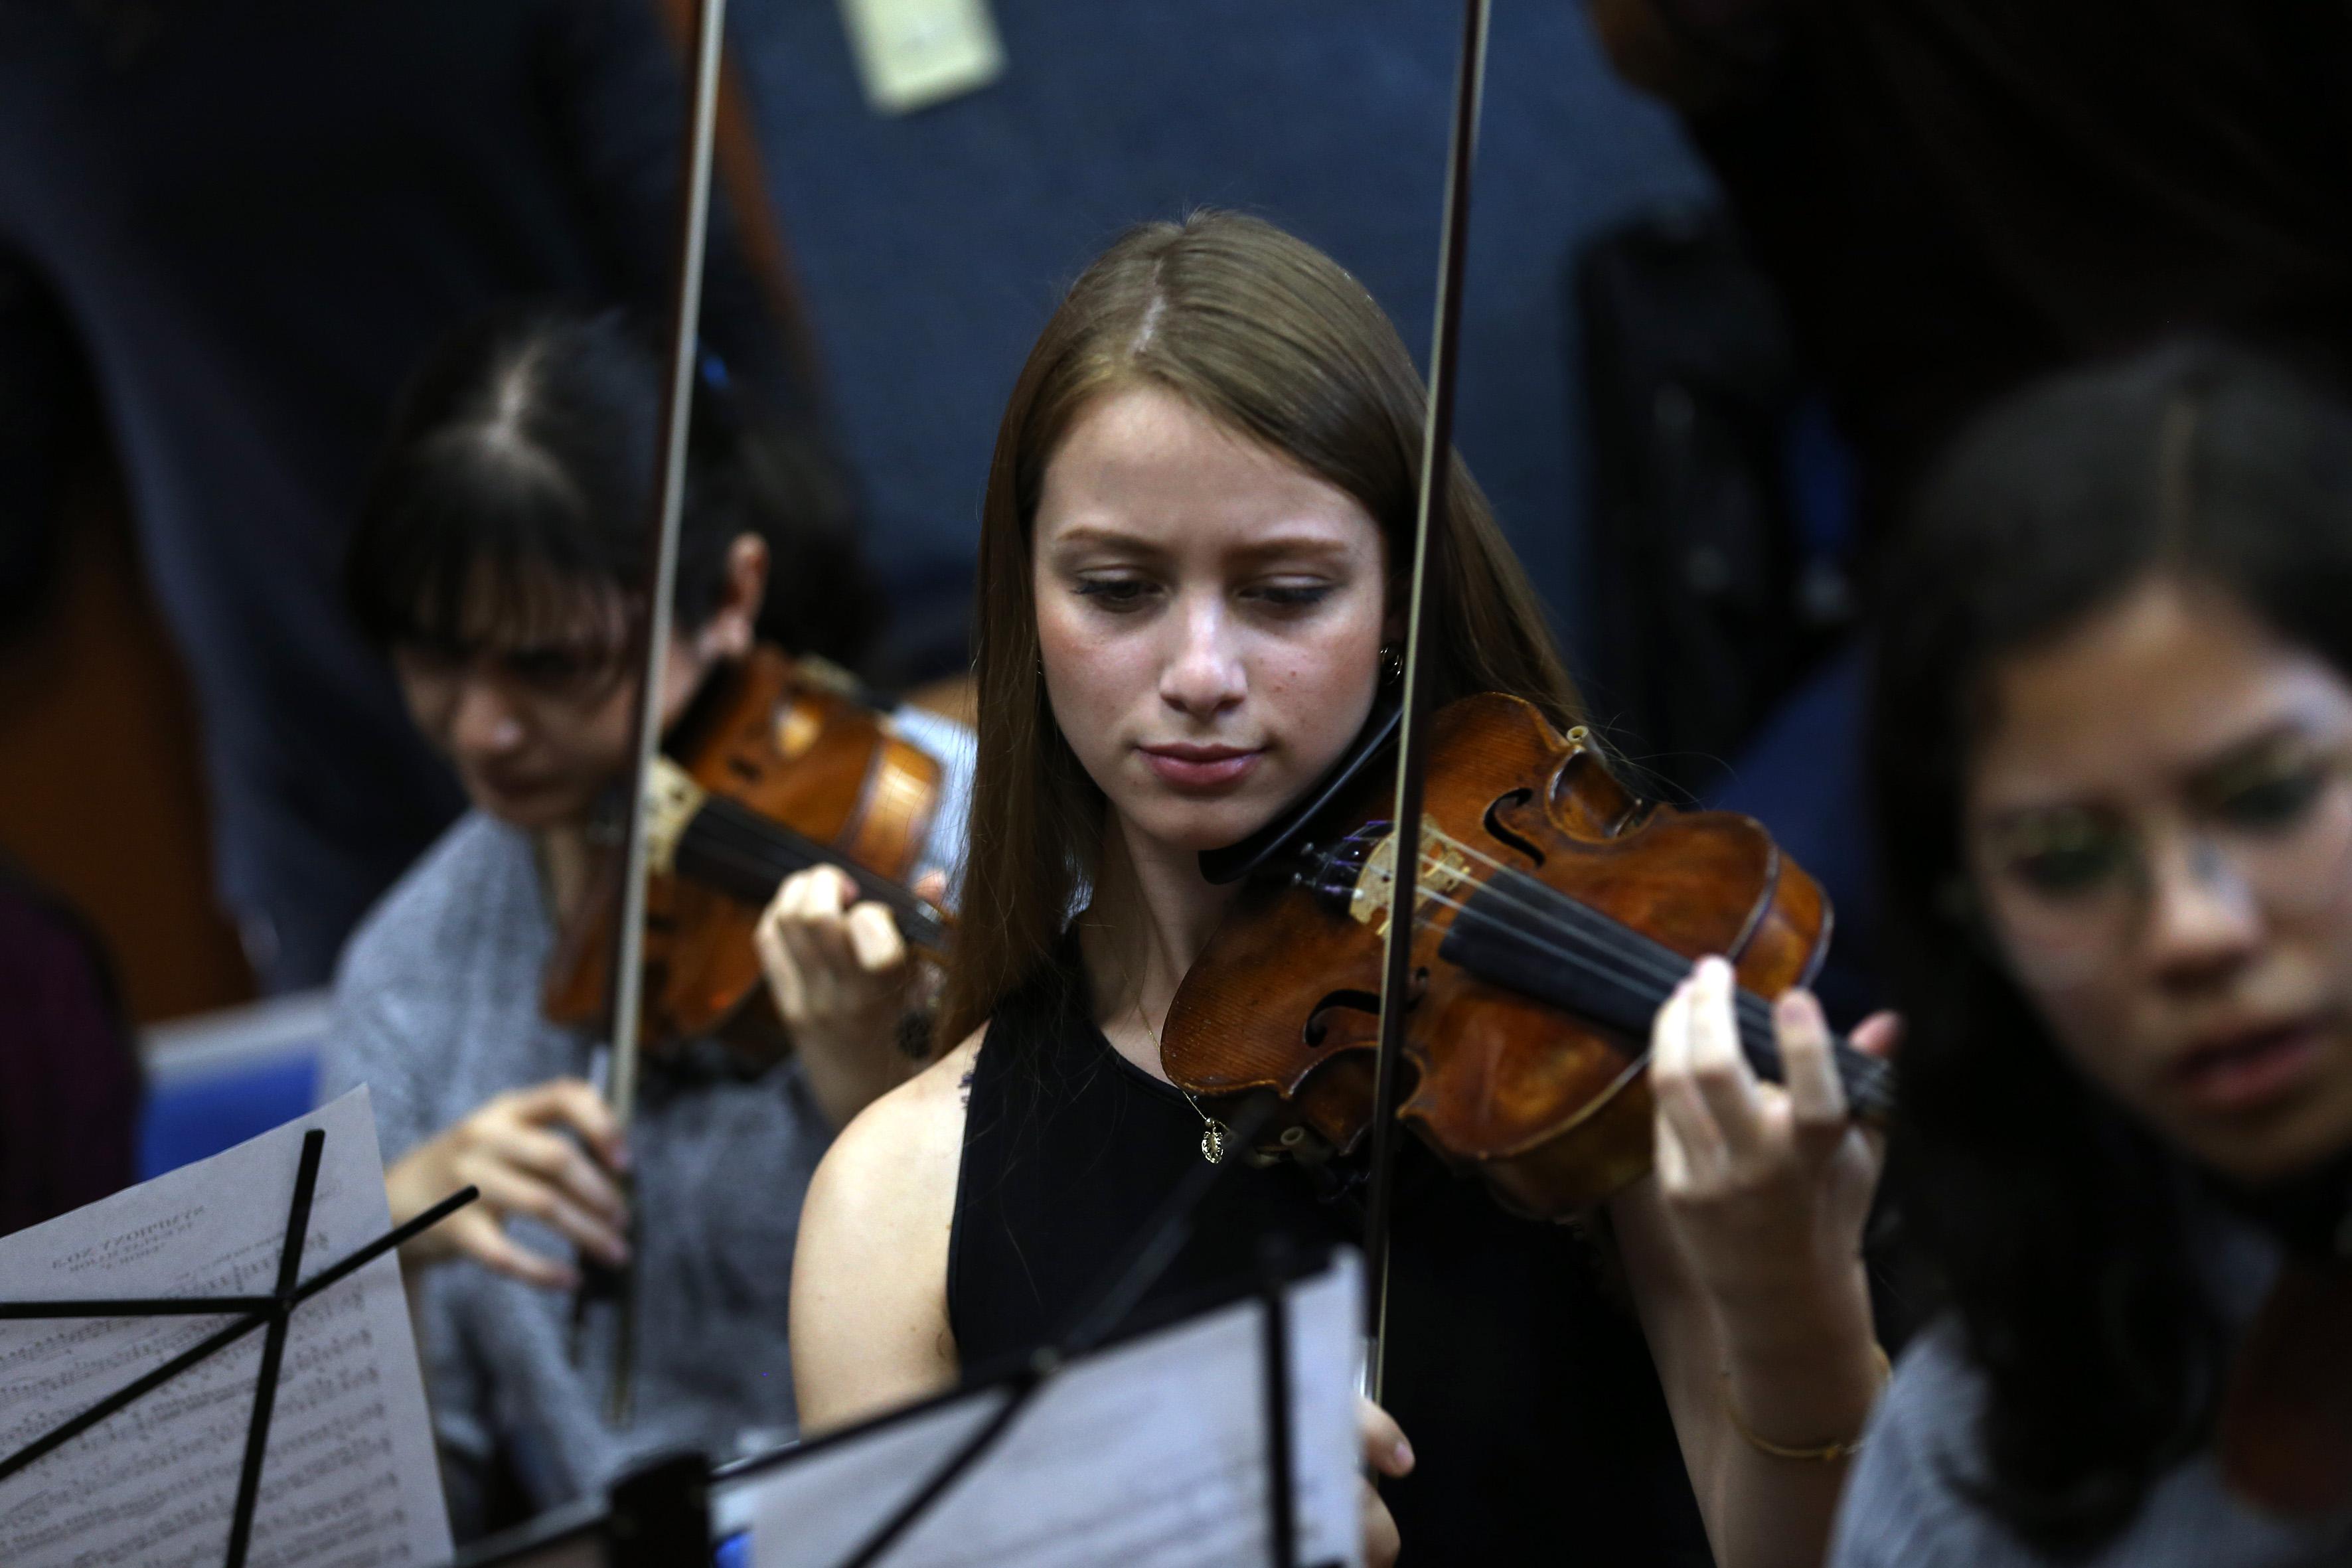 Estudiante de Música tocando violín